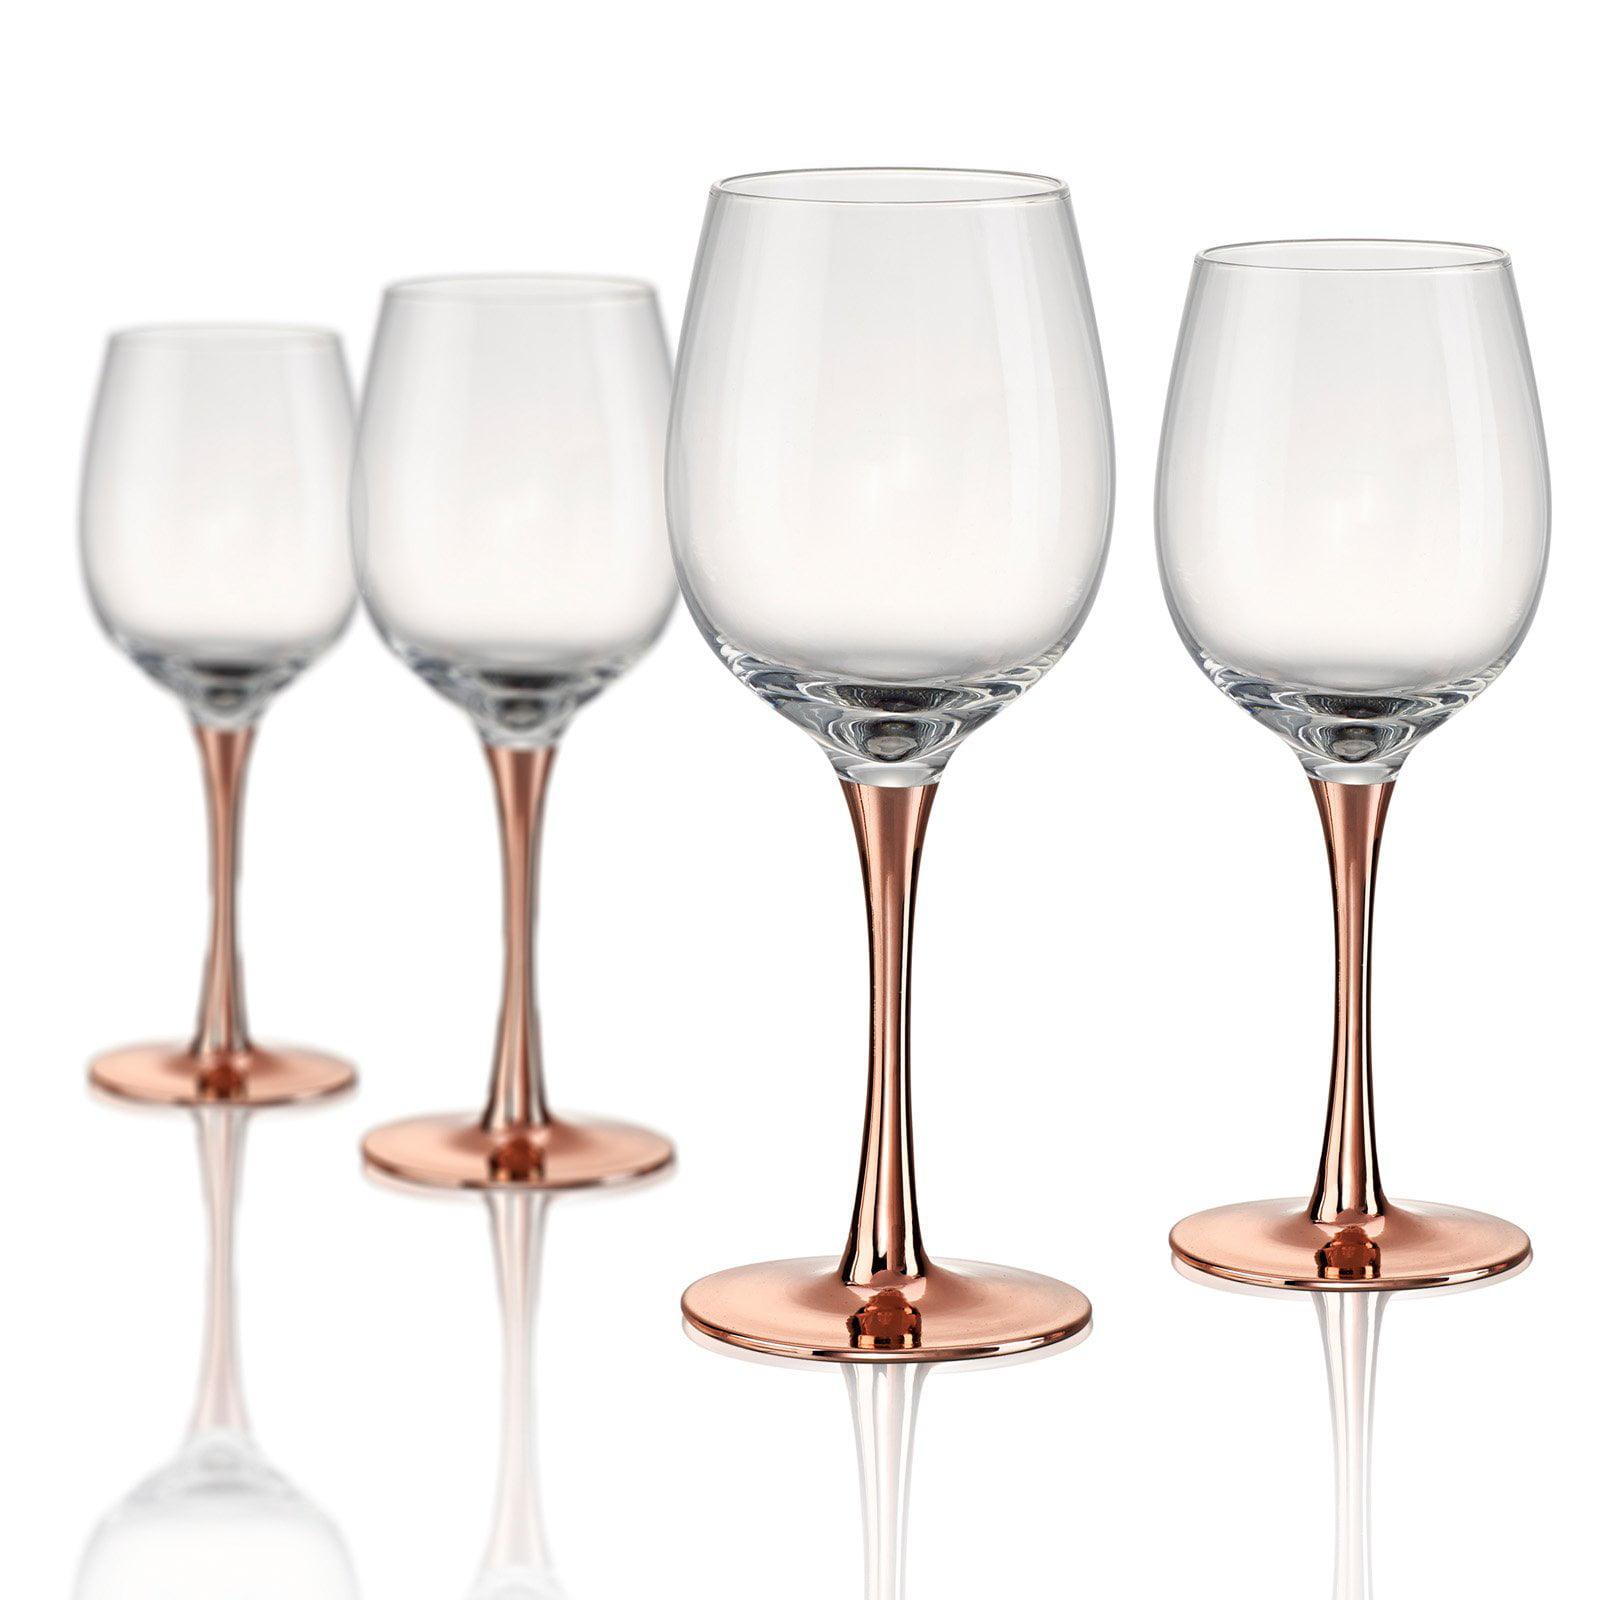 Artland Coppertino Wine Glass Set of 4 by Artland